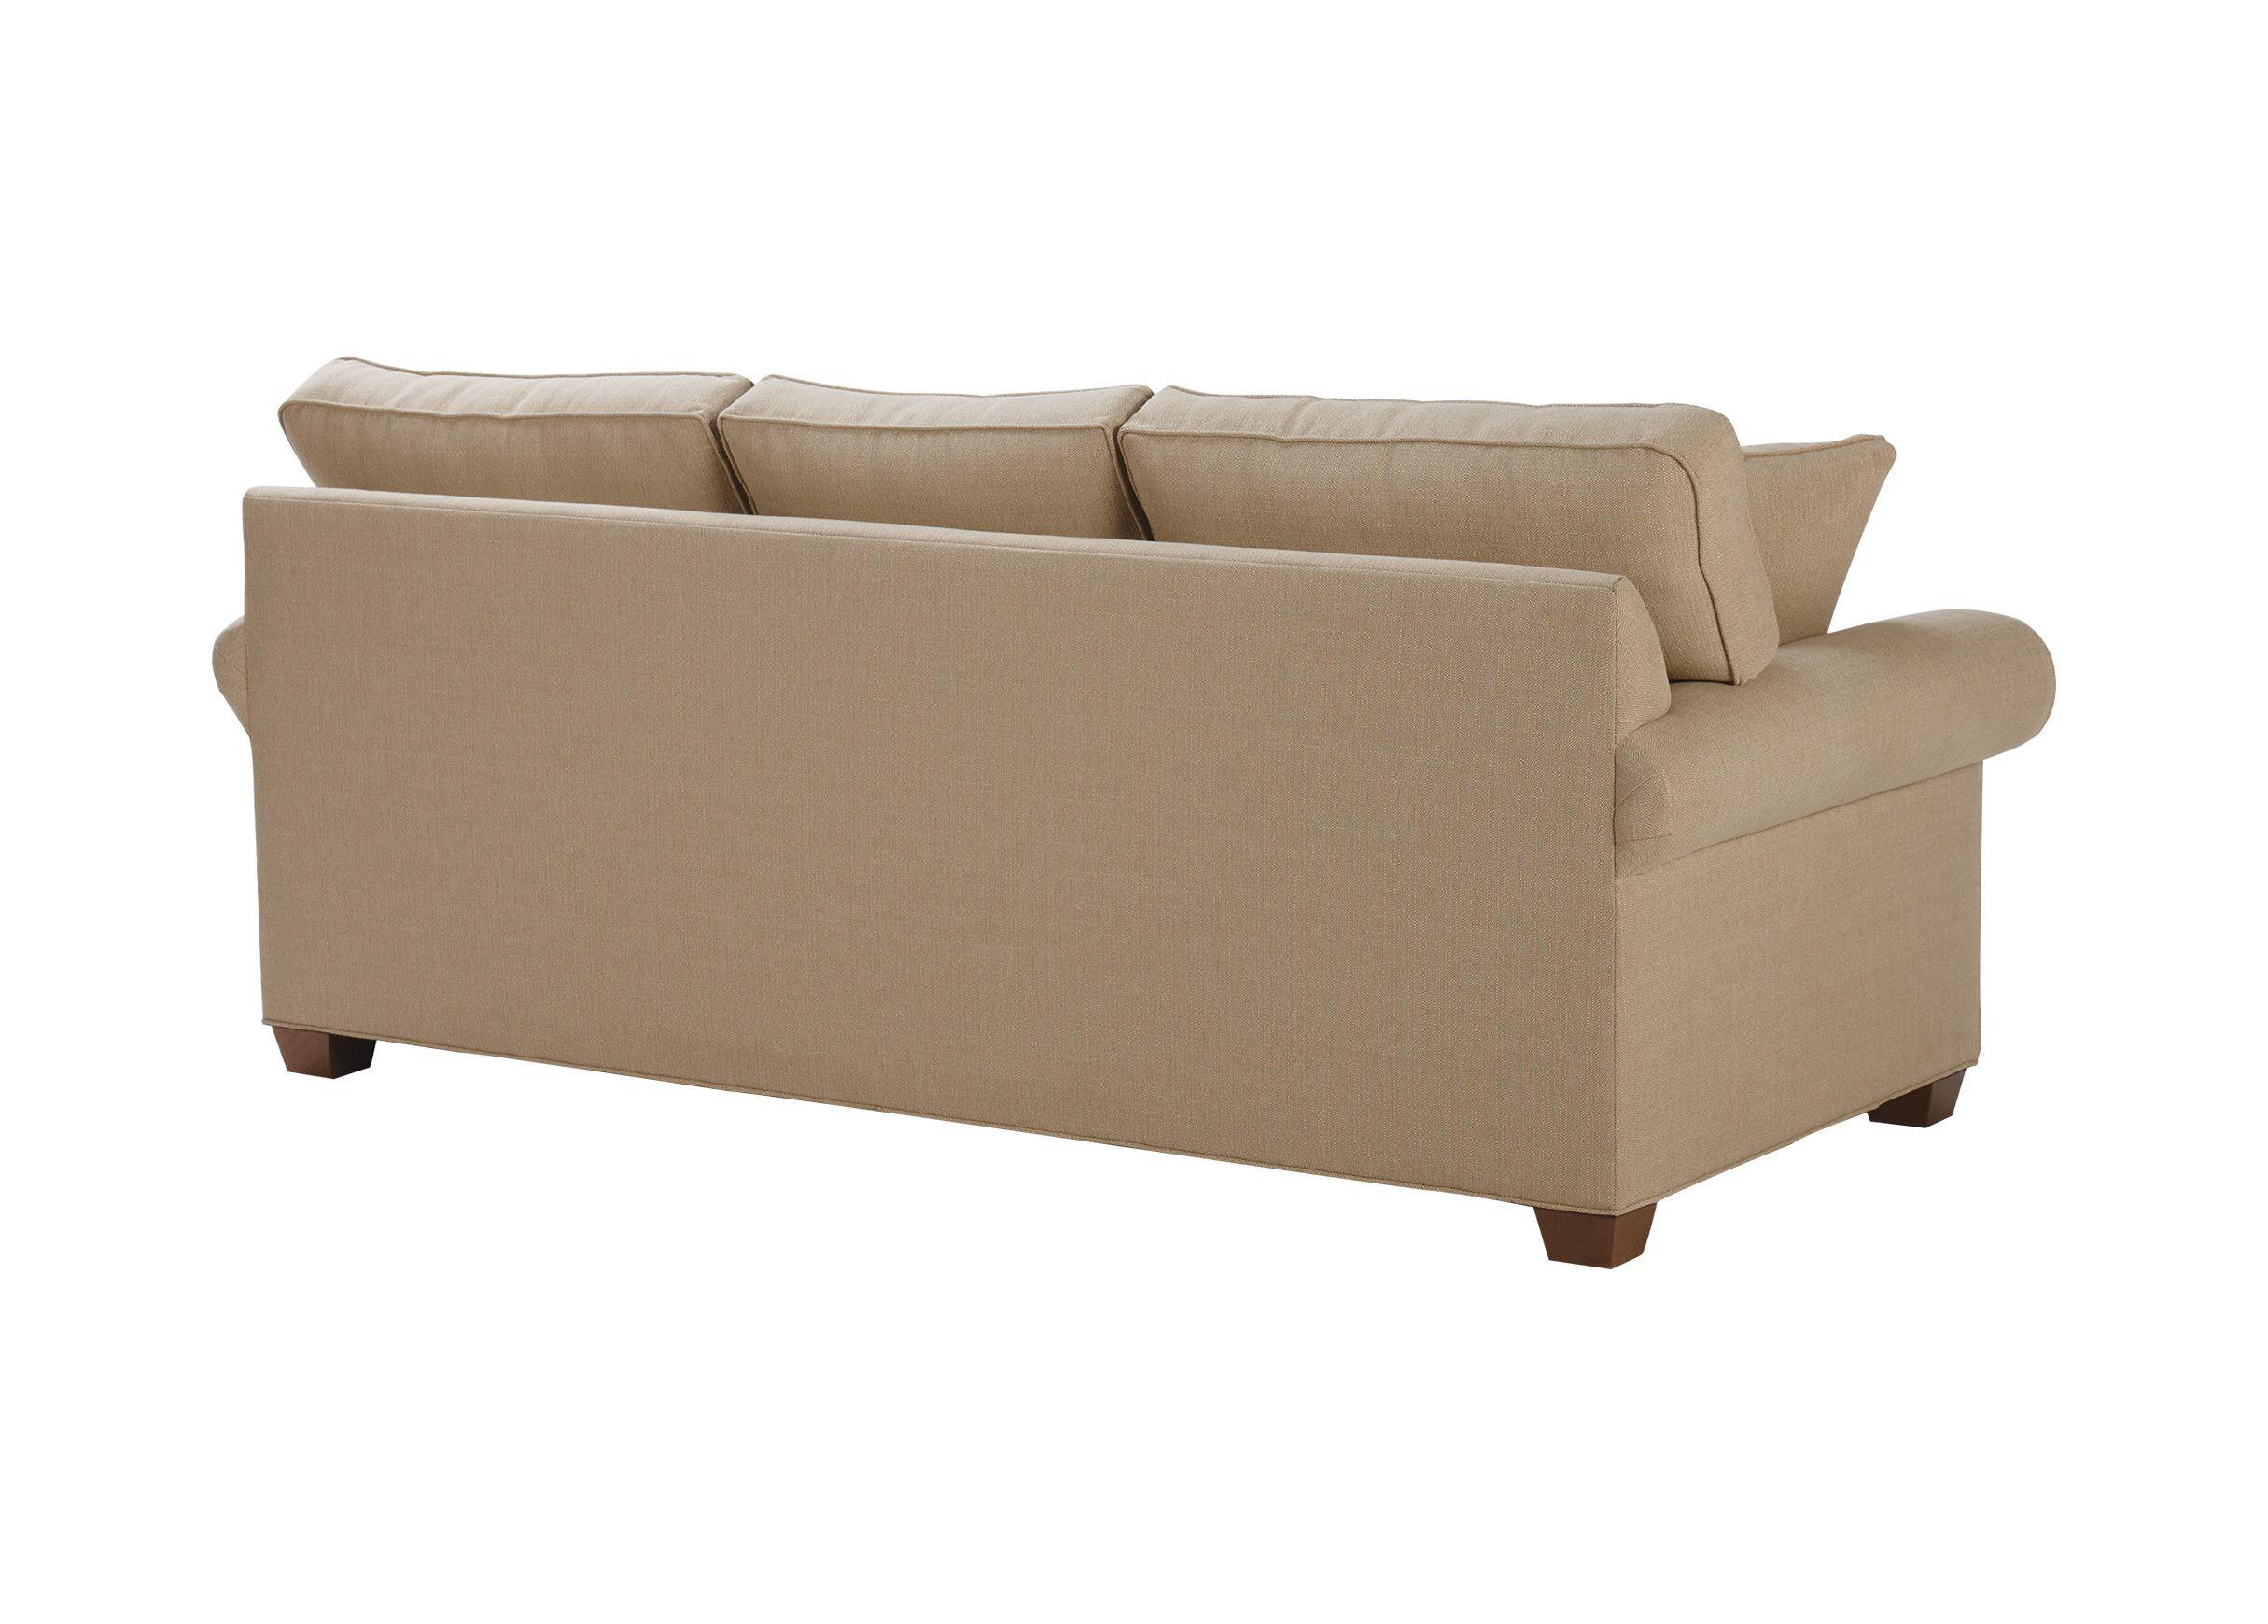 roll arm sofa canada corner cover design bennett loveseat ethan allen